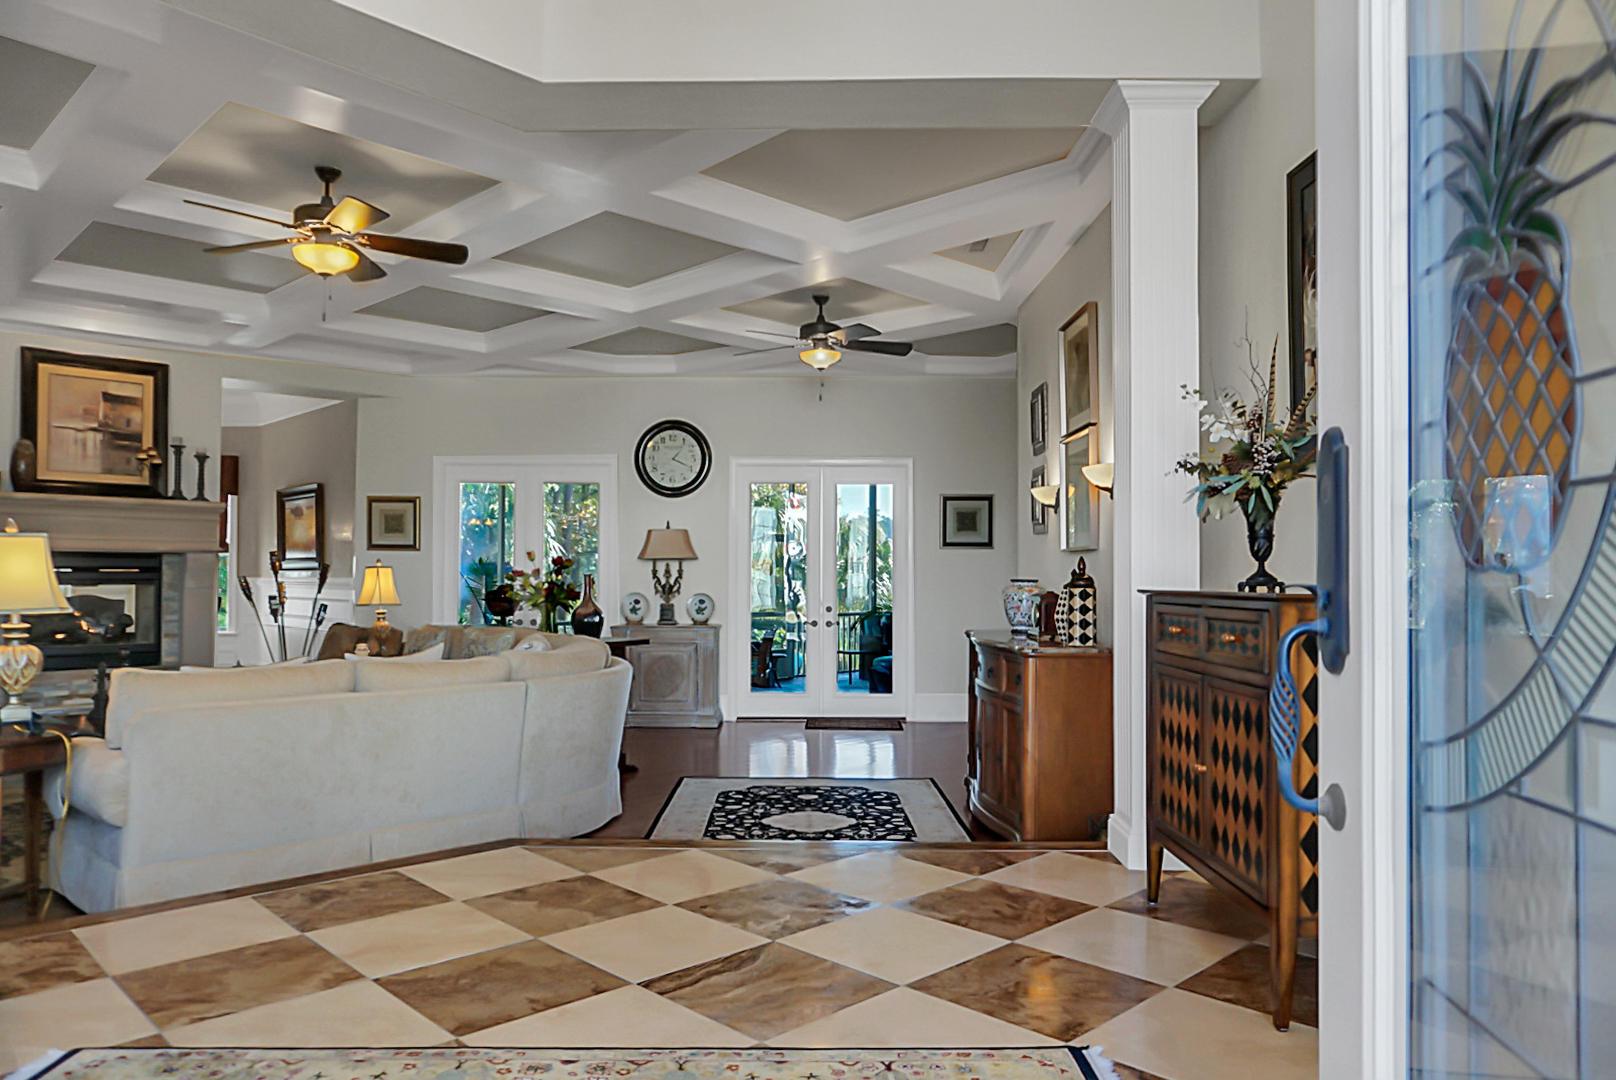 Dunes West Homes For Sale - 2389 Darts Cove, Mount Pleasant, SC - 57